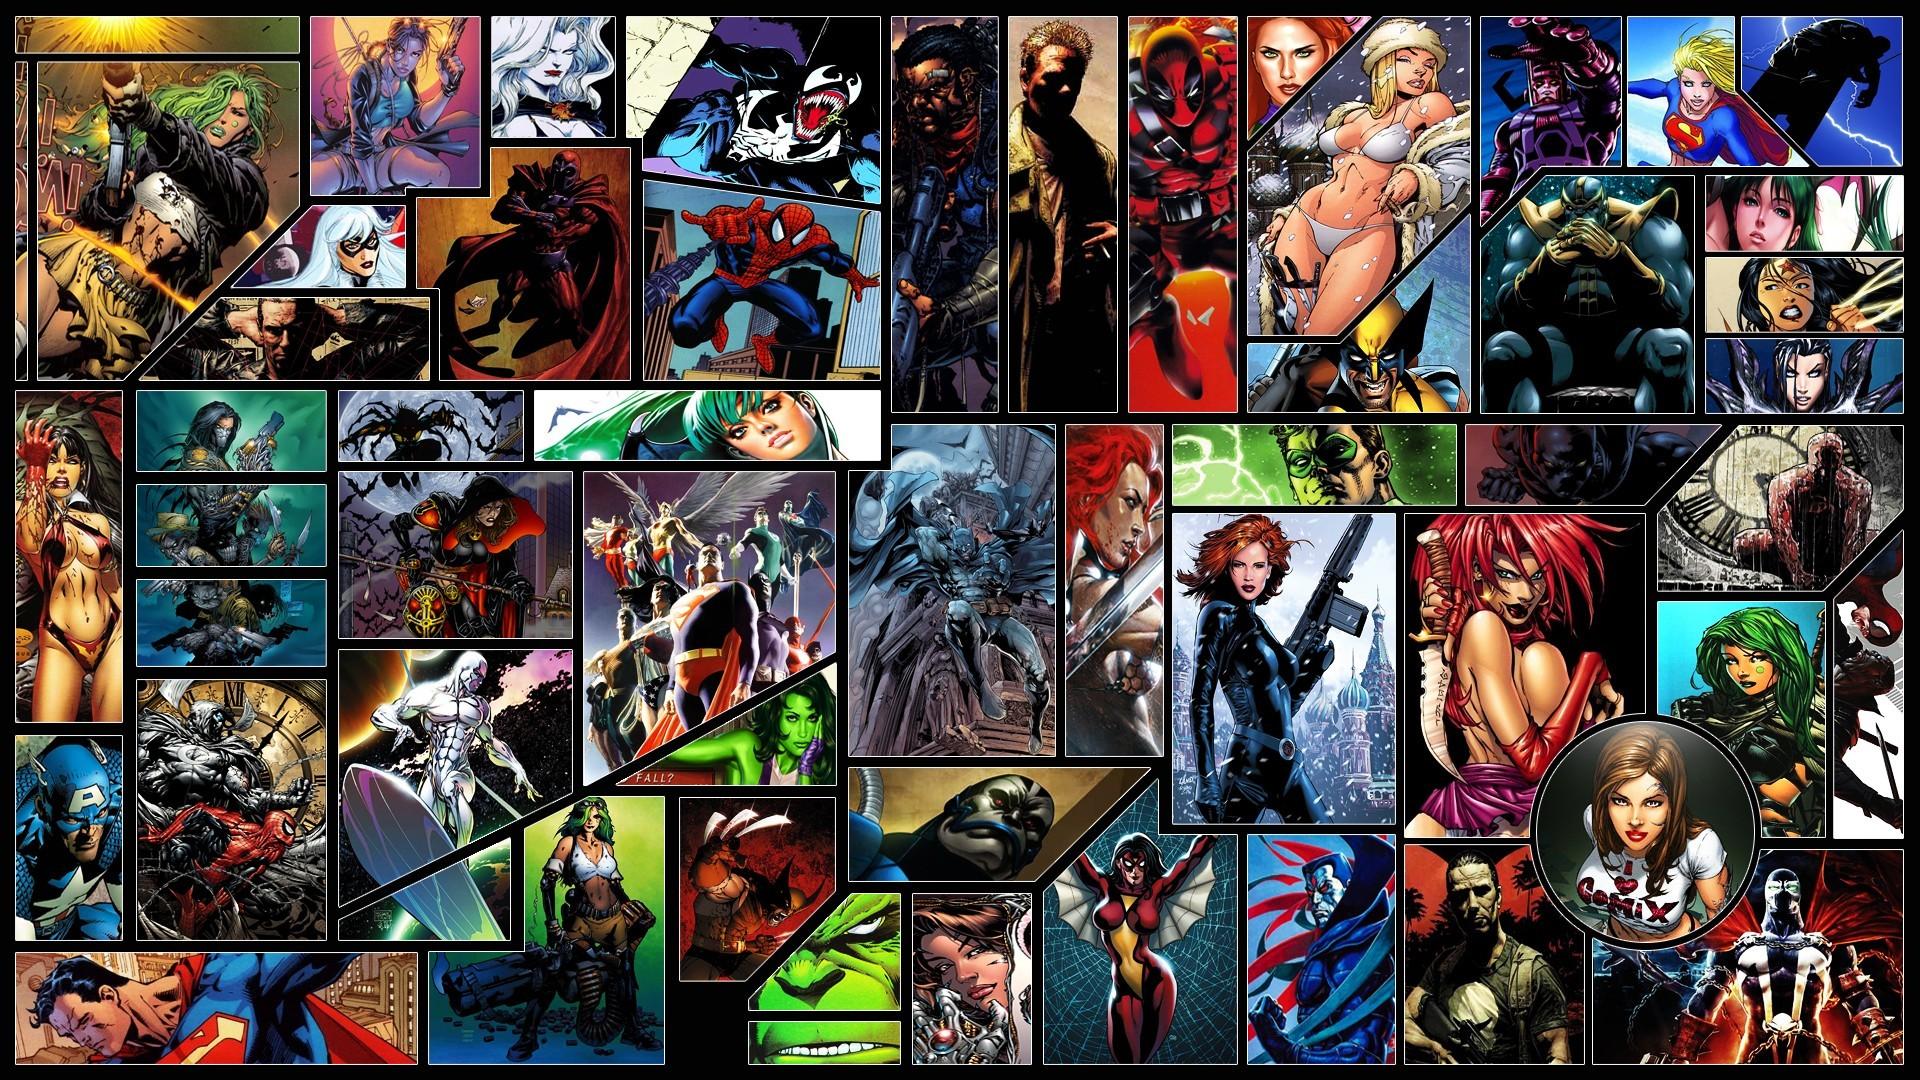 Marvel Black Widow Spider-Man Deadpool Silver Surfer Hulk Superman Green  Lantern Wolverine Batman Captain America Tomb Raider Lara Croft Supergirl  Wonder …